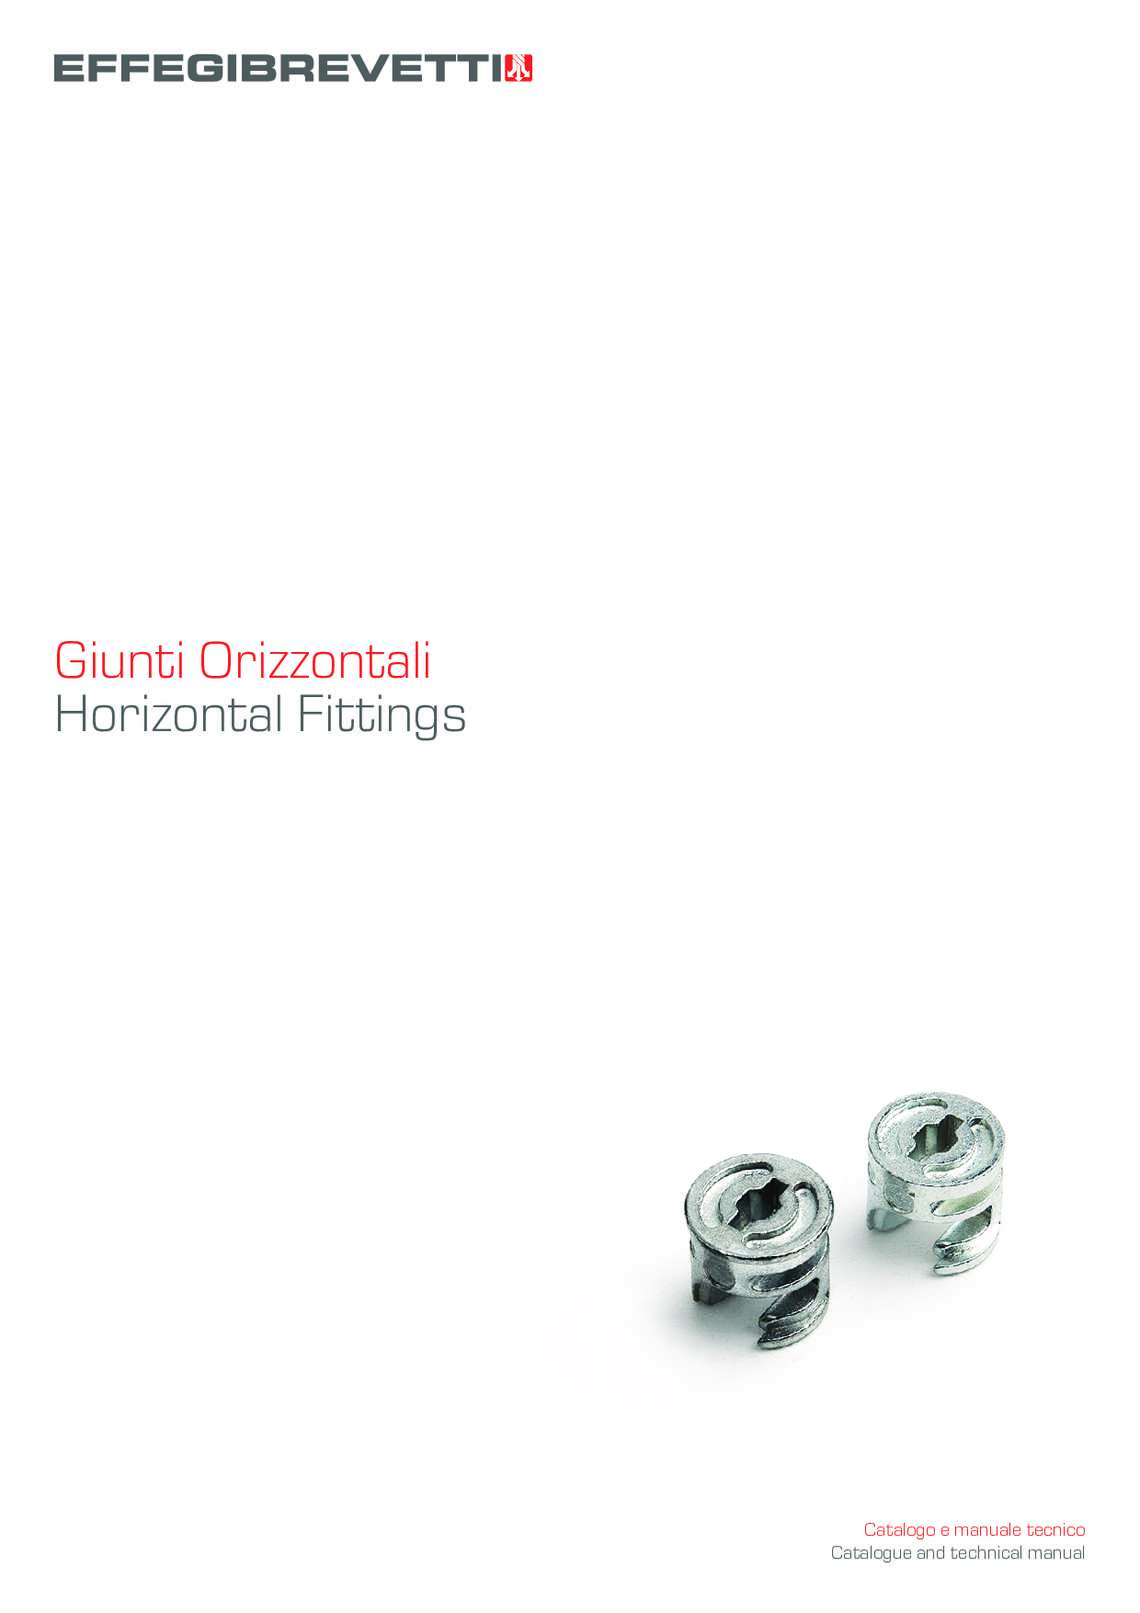 Horizontal Fittings